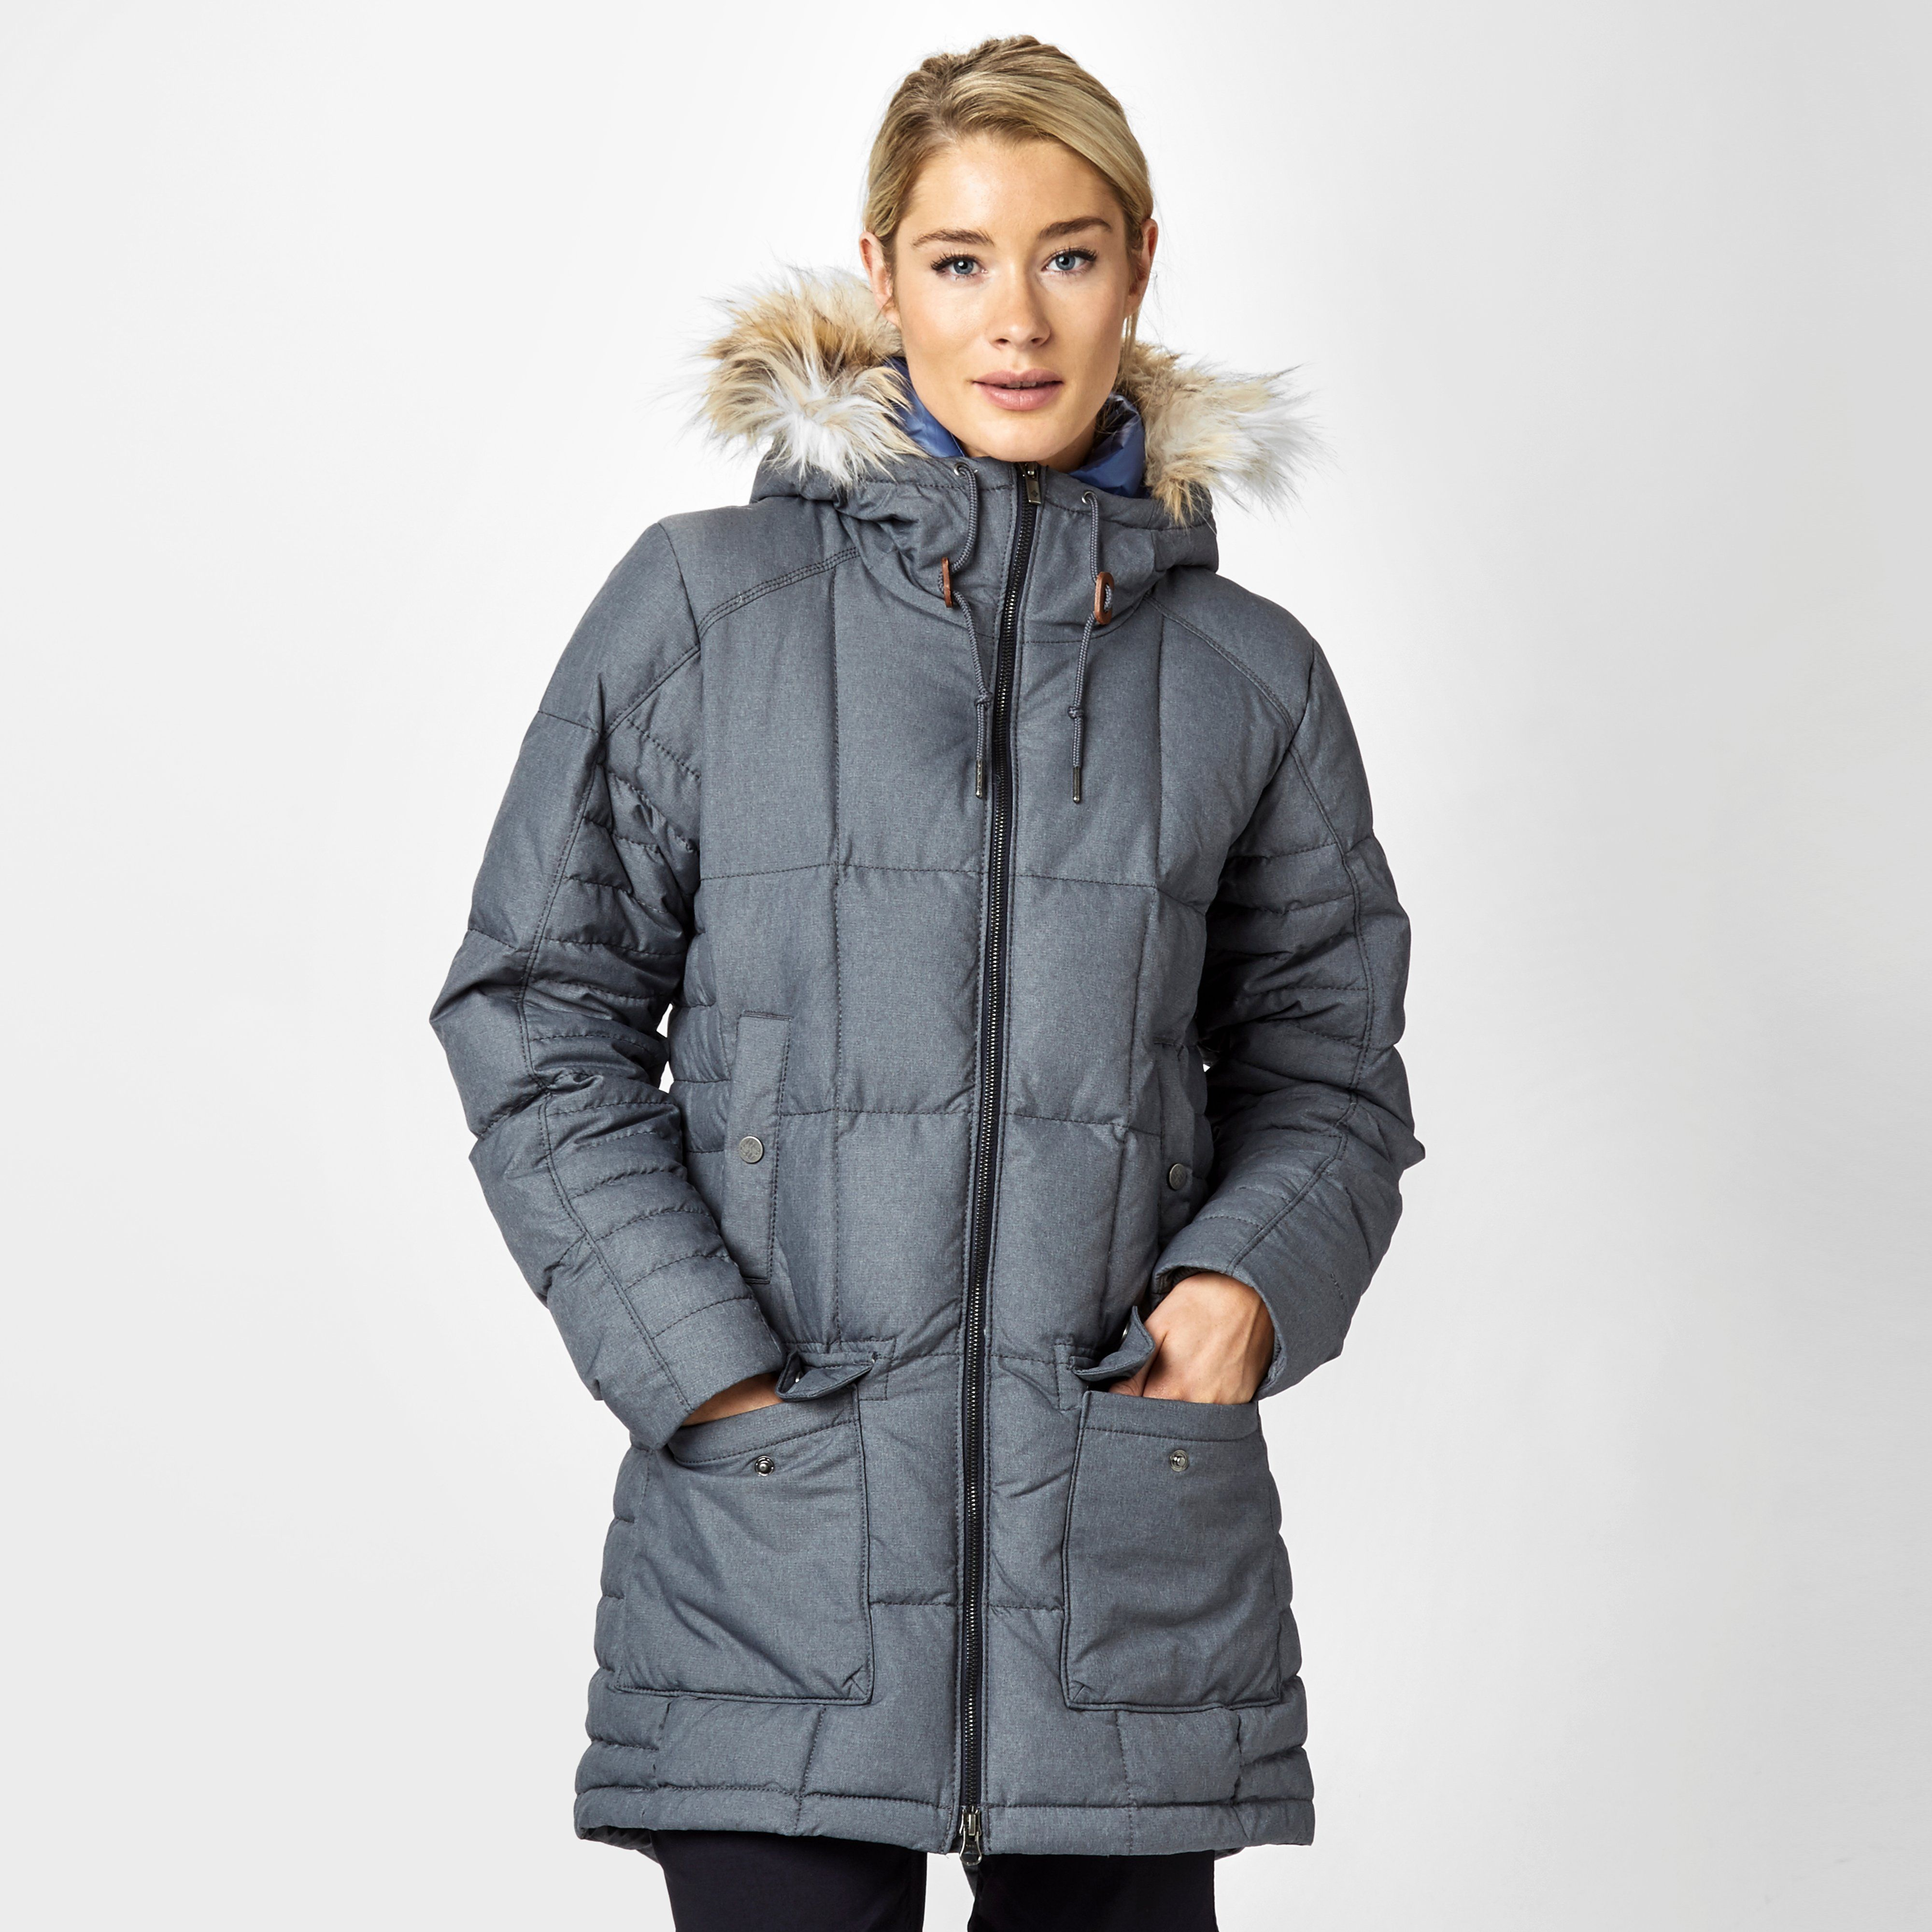 COLUMBIA Women's Della Fall™ Parka Jacket